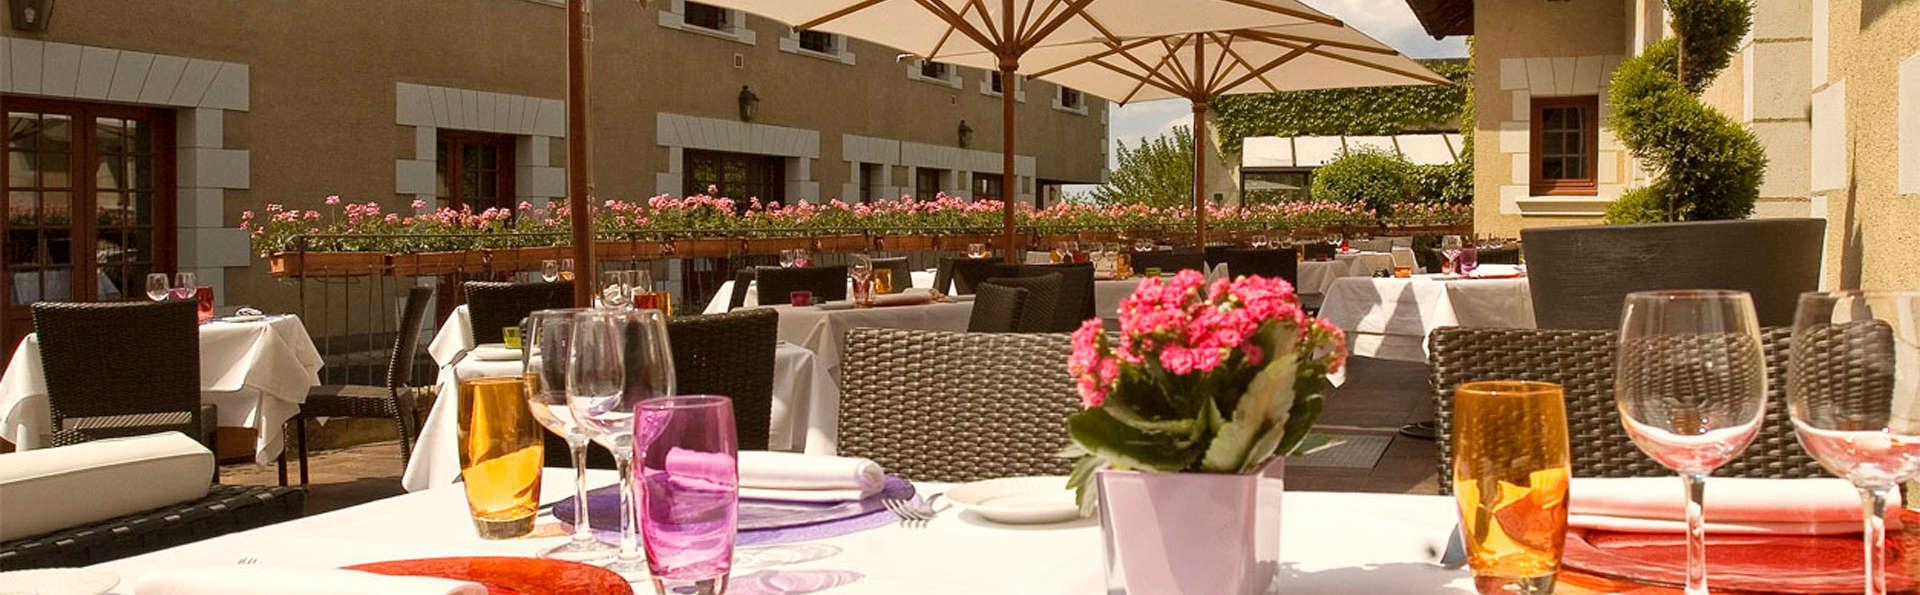 Hostellerie La Croix Blanche - EDIT_terrace.jpg